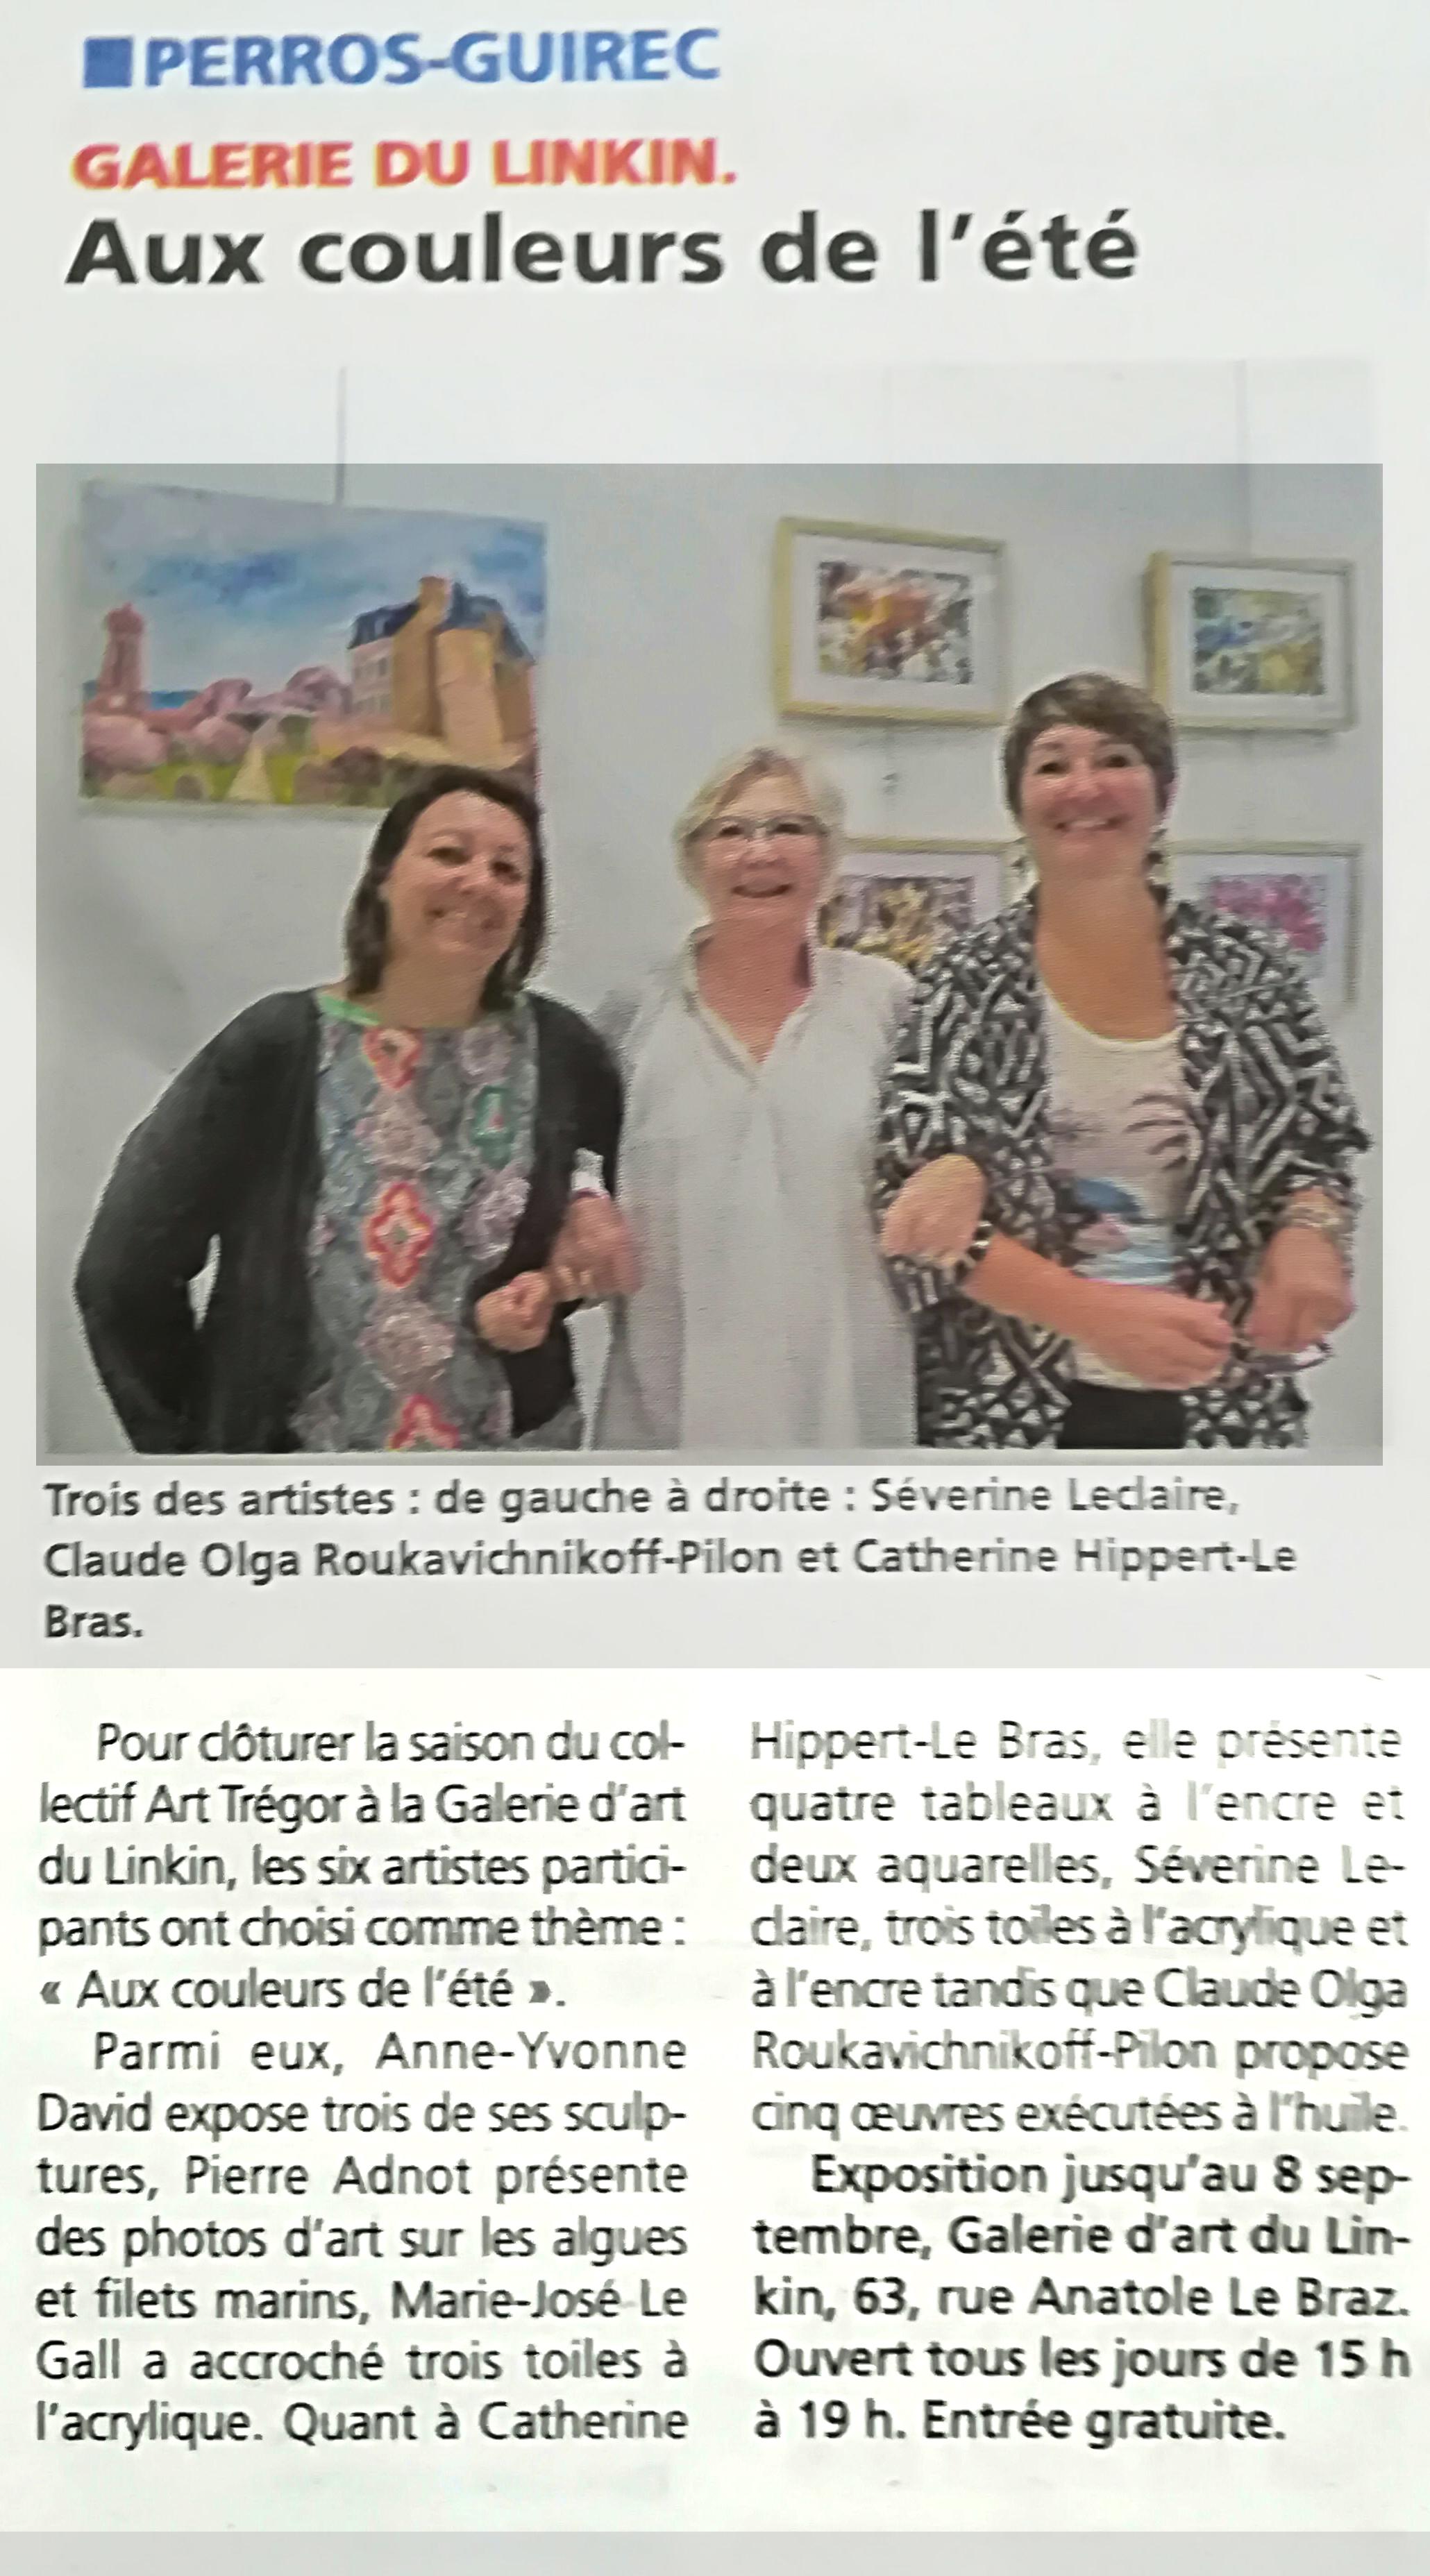 Exposition-Galerie-Du-Linkin-septembre-2017